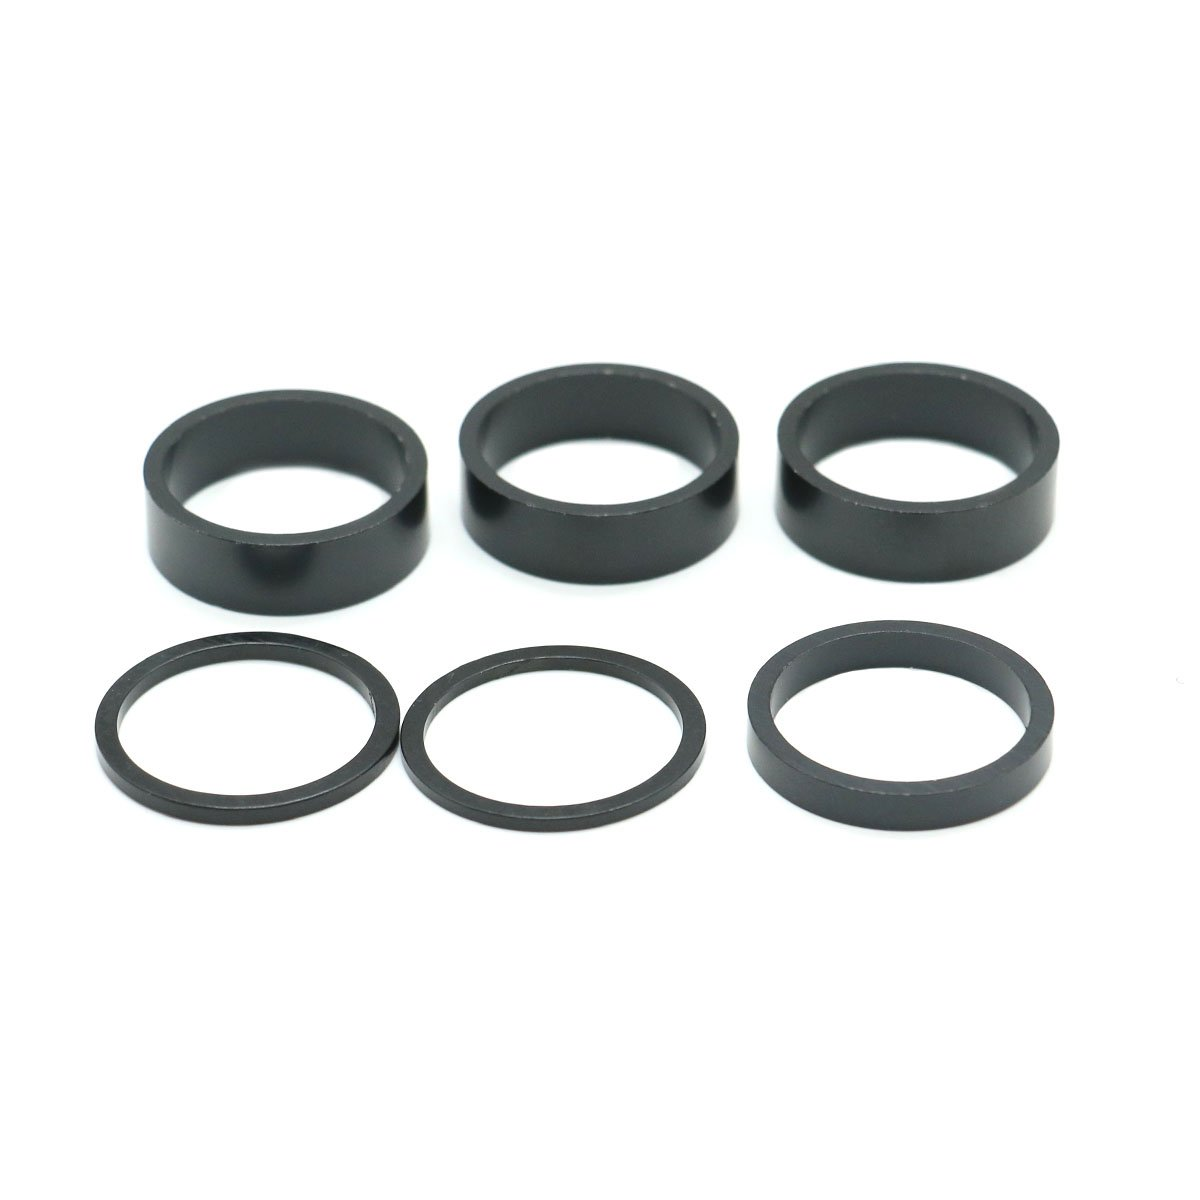 Sunex 214um 1//2-Inch Drive 14-mm Universal Impact Socket